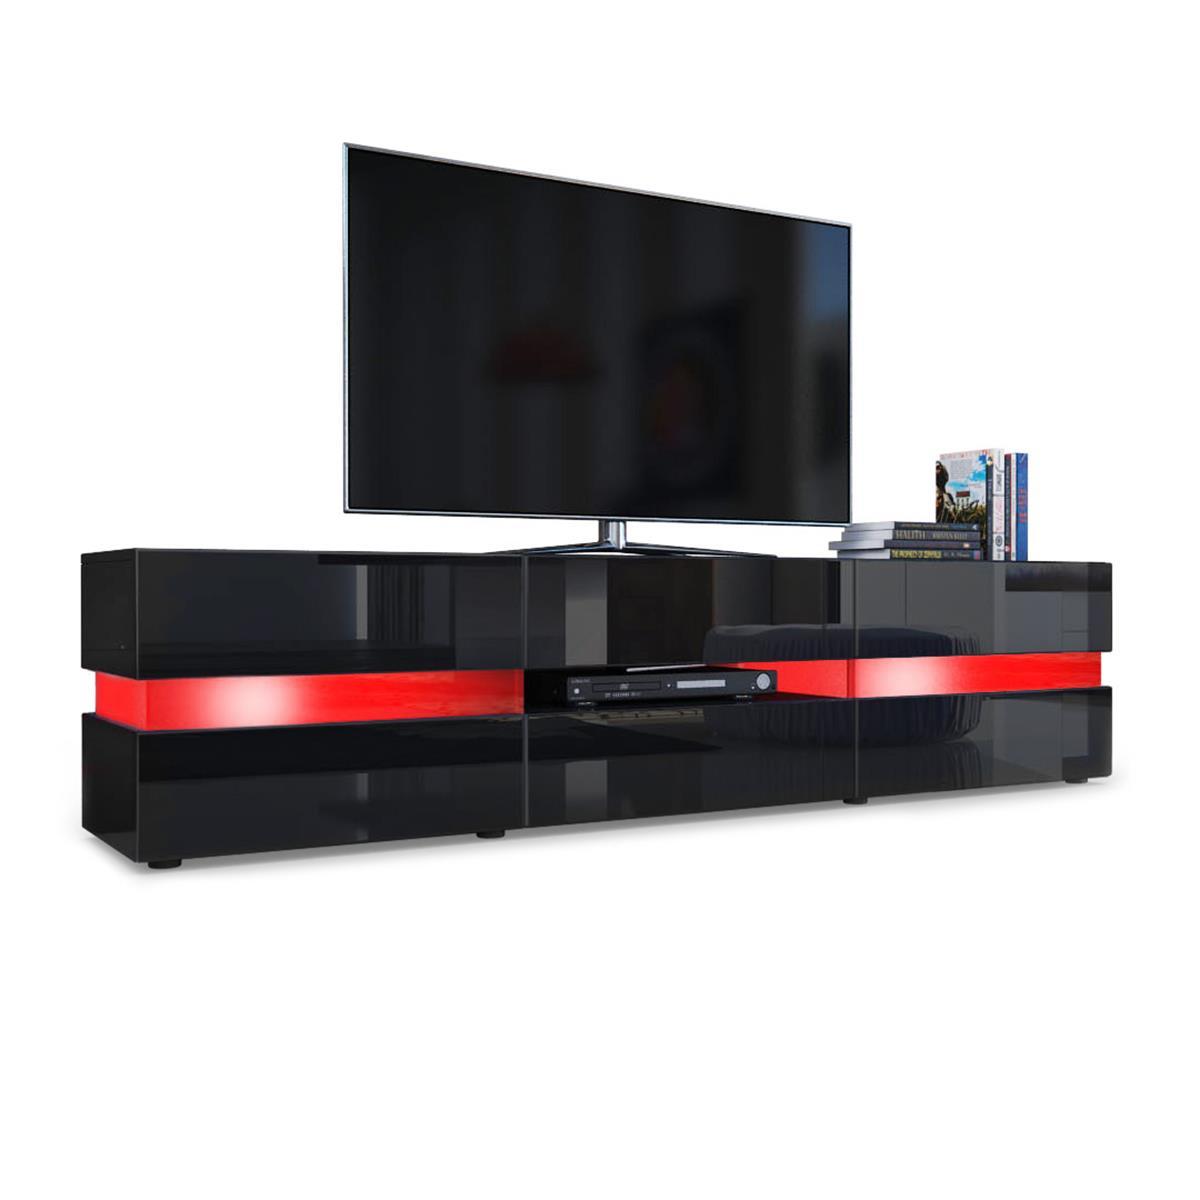 Lowboard led  Flow TV Board: Ambient-Light mit Lounge-Feeling